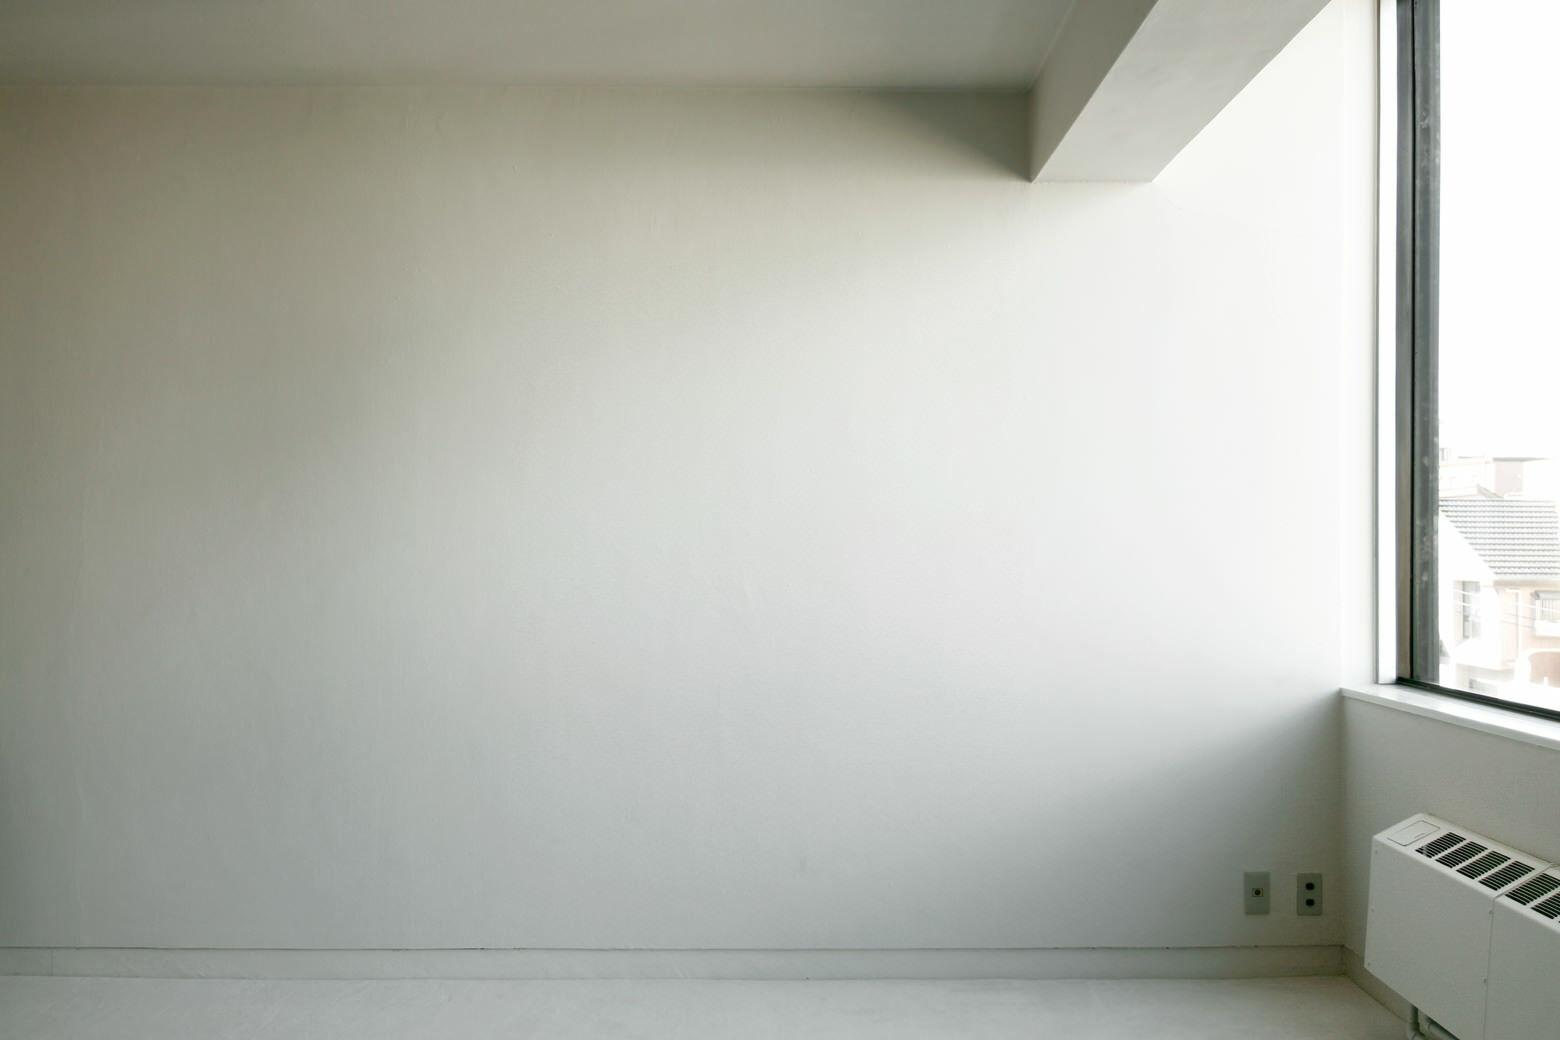 FEM(フェム)自然光の差し込大きな白い壁